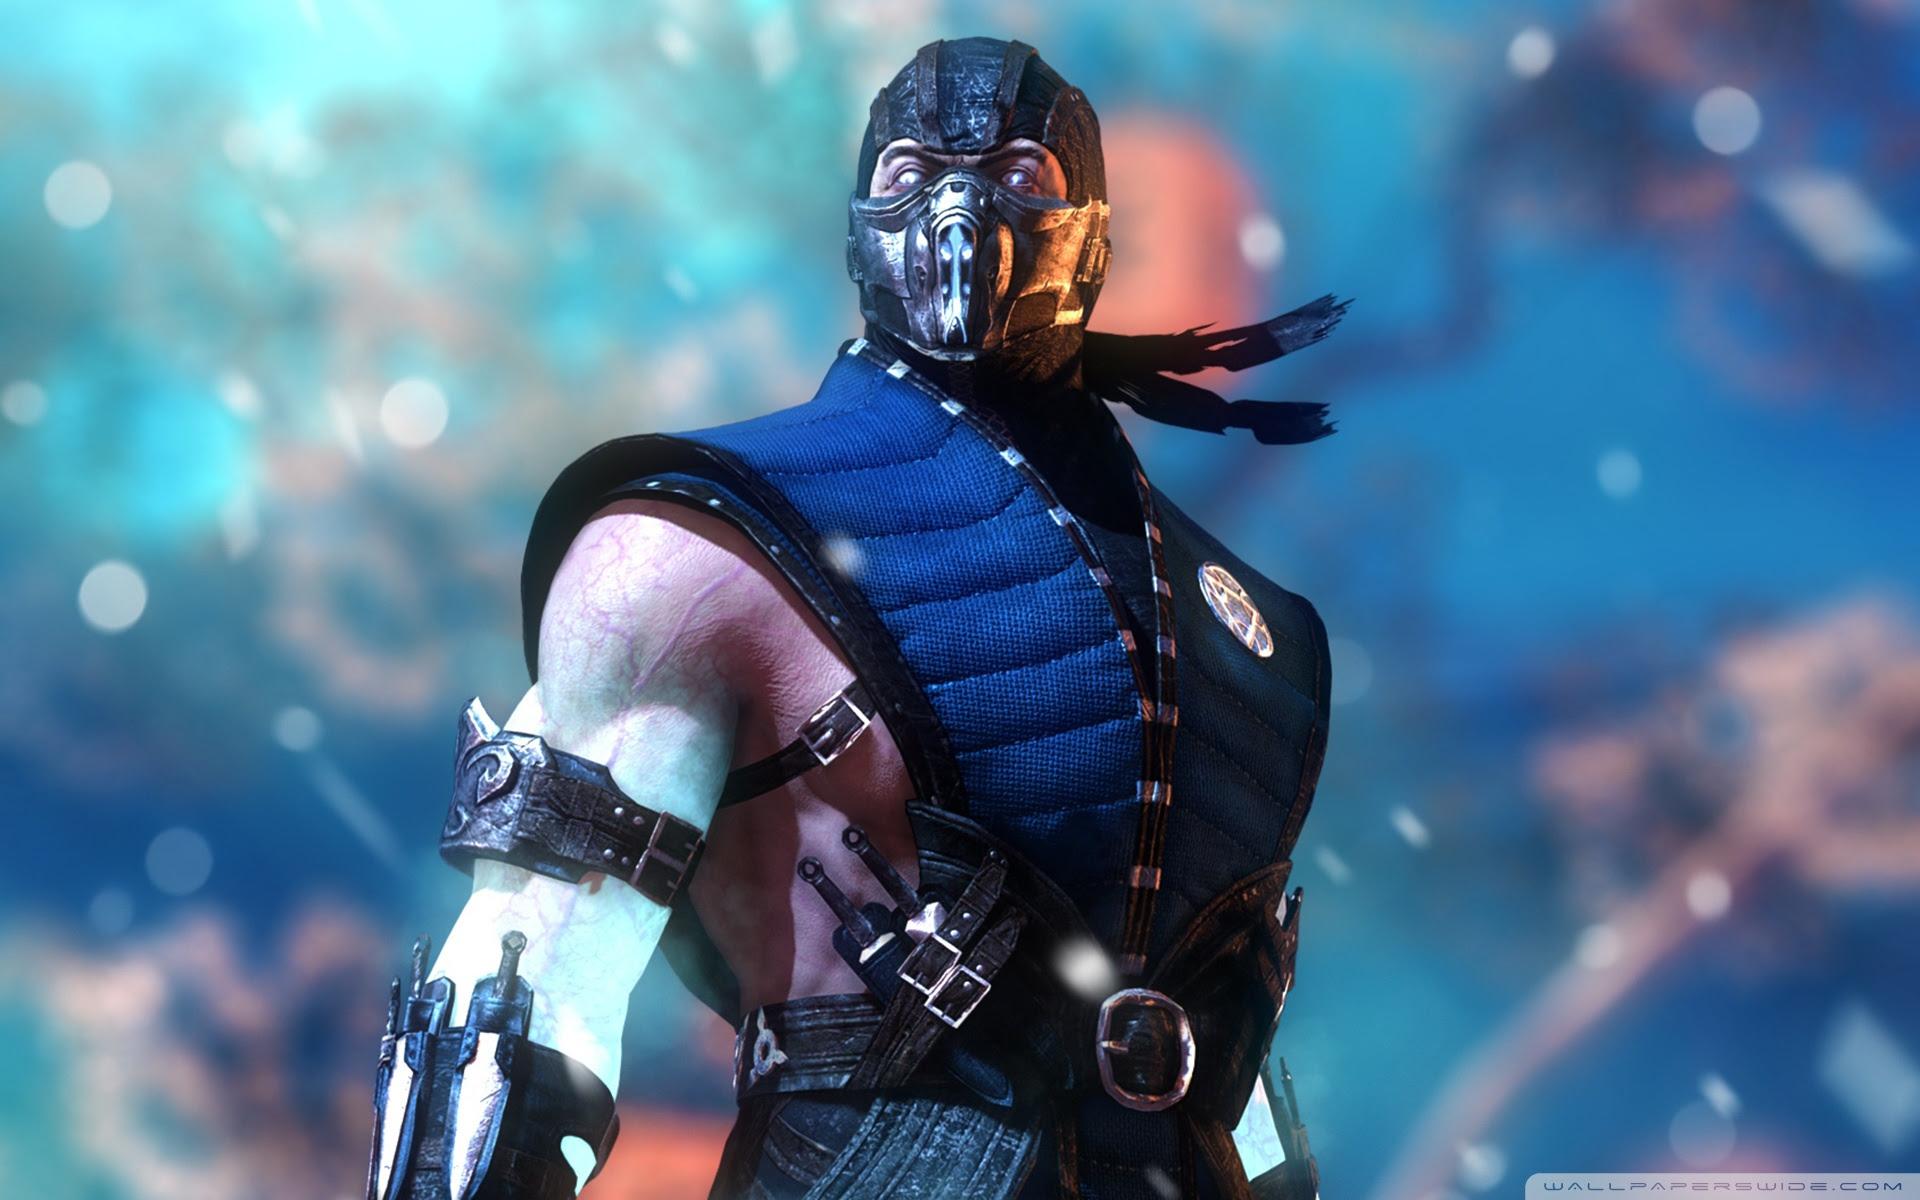 Mortal Kombat X Ultra Hd Desktop Background Wallpaper For 4k Uhd